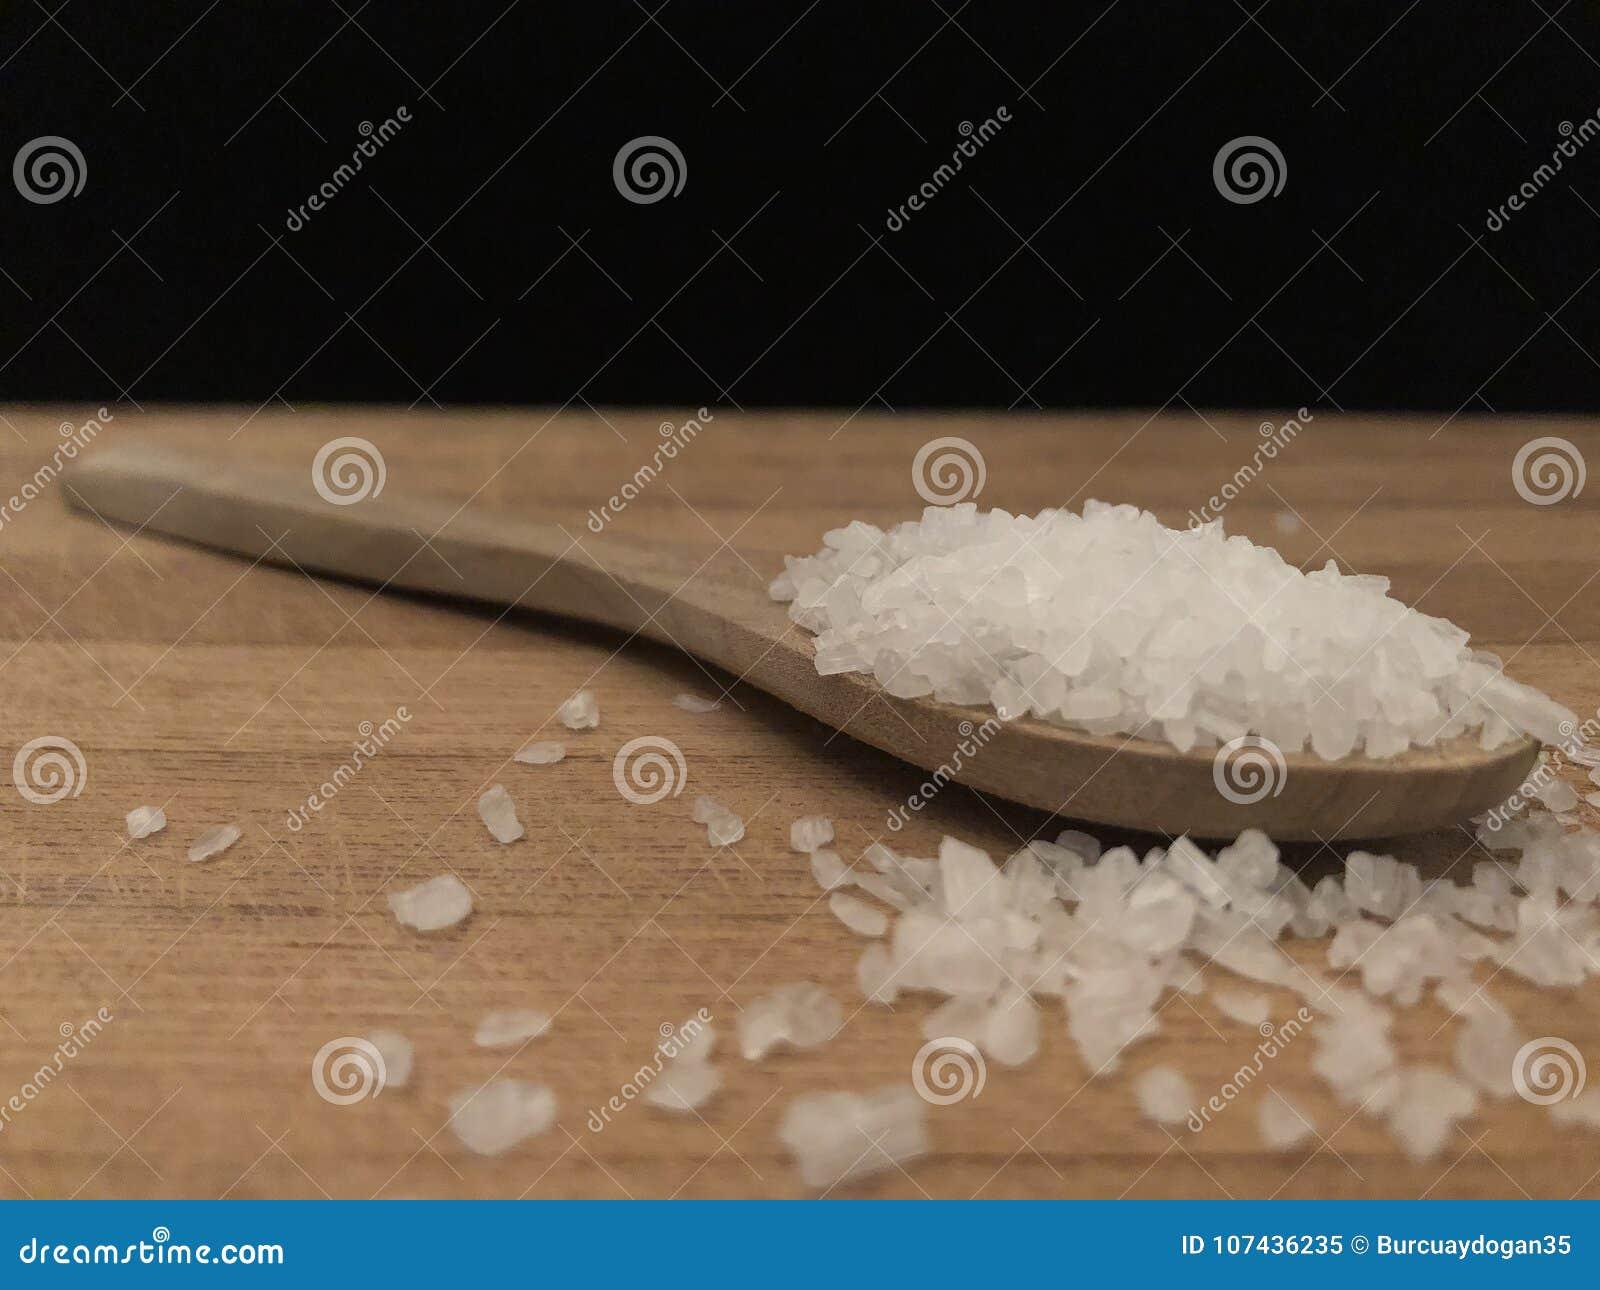 Rock salt in the wooden spoon on the wooden cutting board with black backboard.